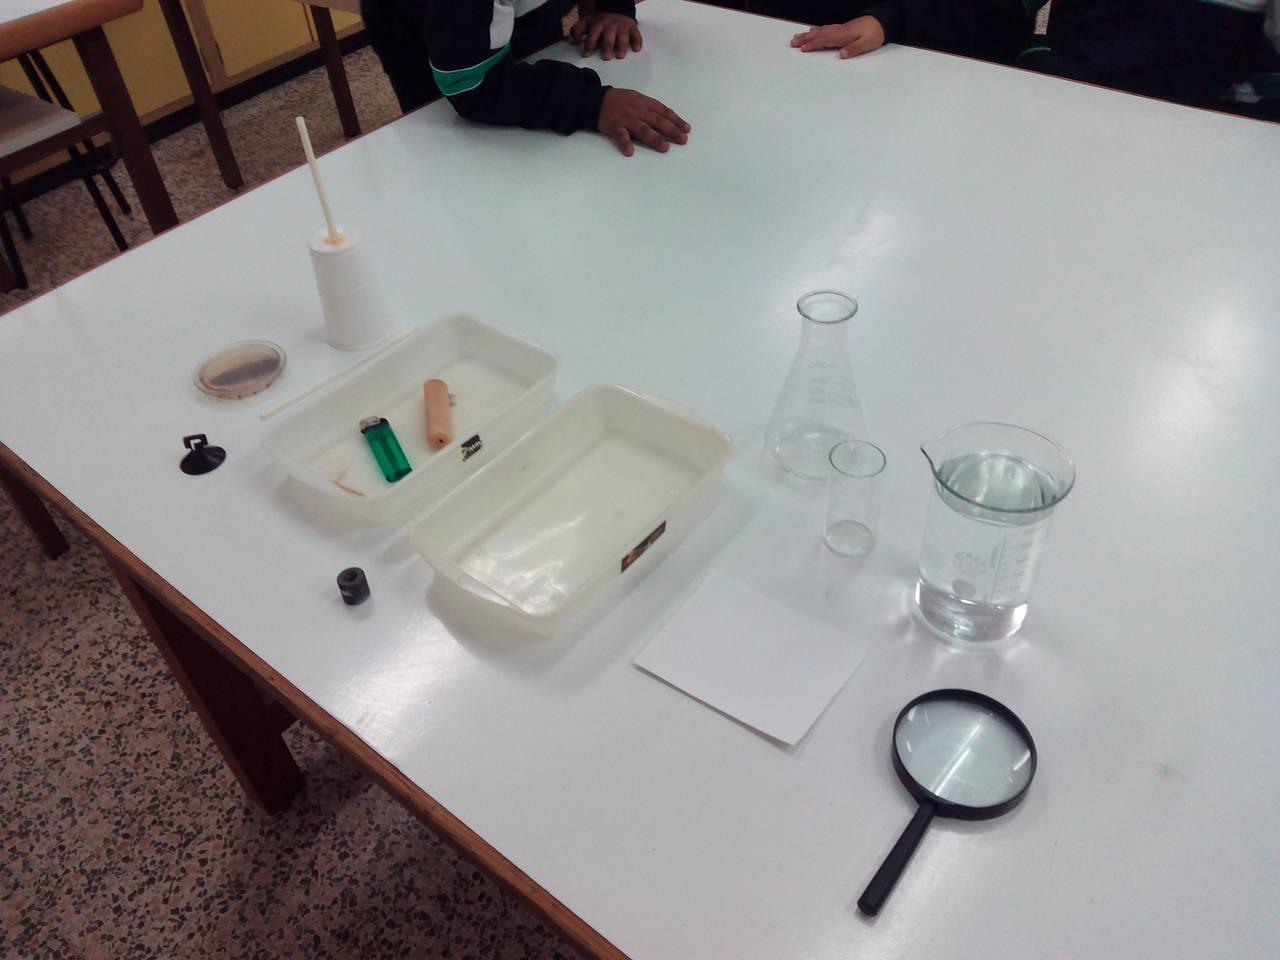 Visita al laboratori (2n)